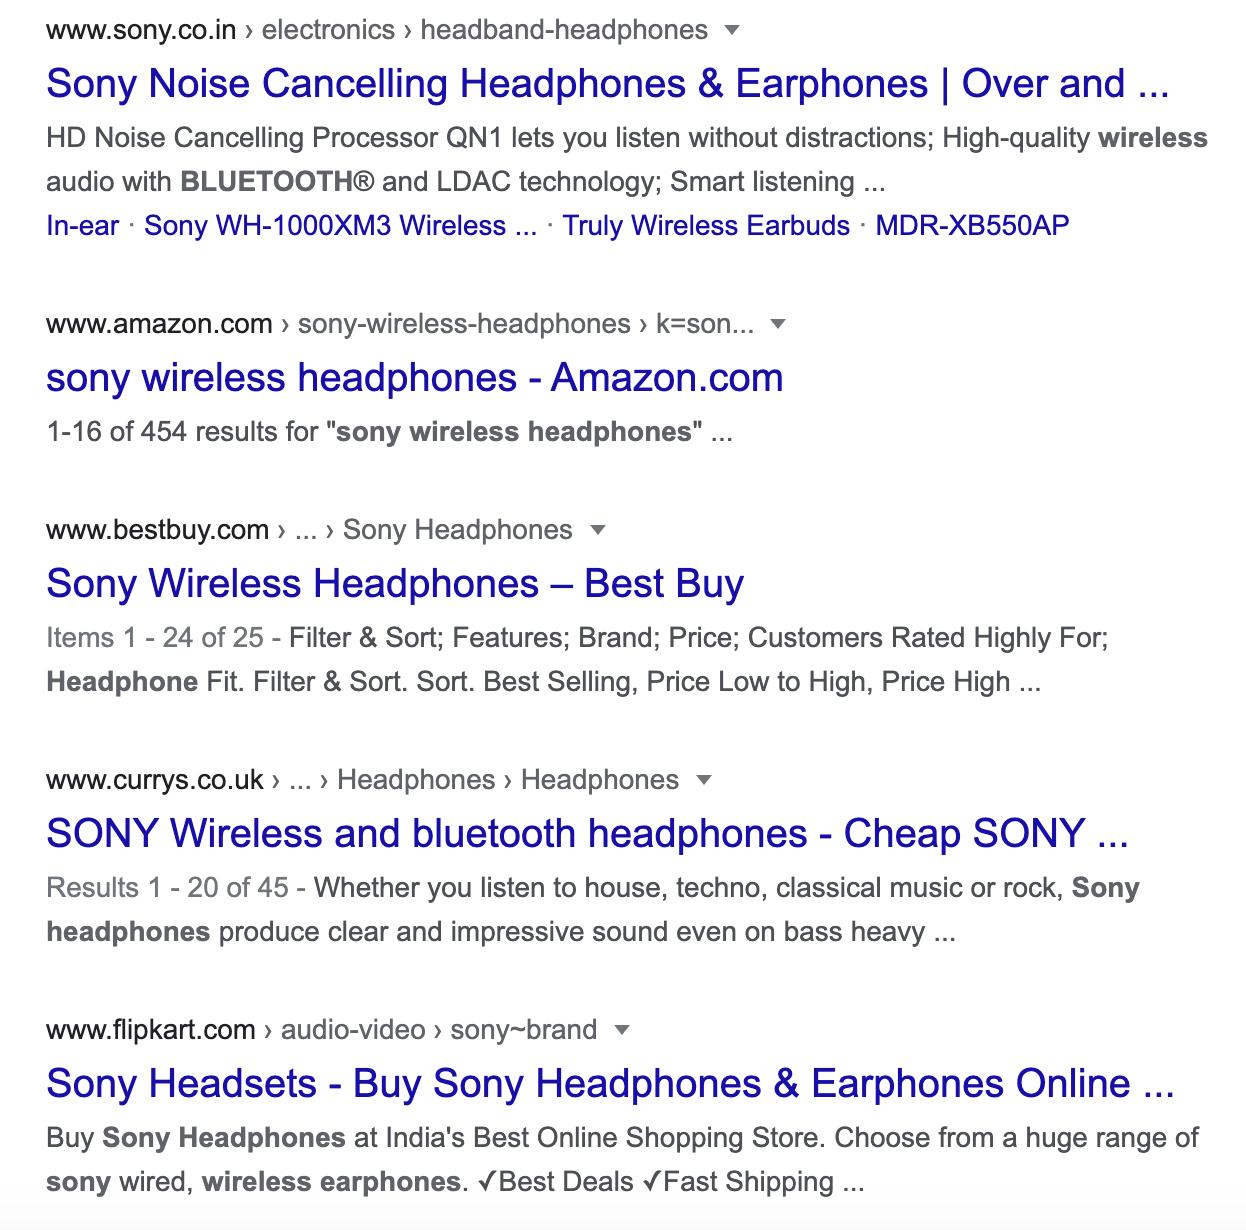 SERP for wireless headphones sony query